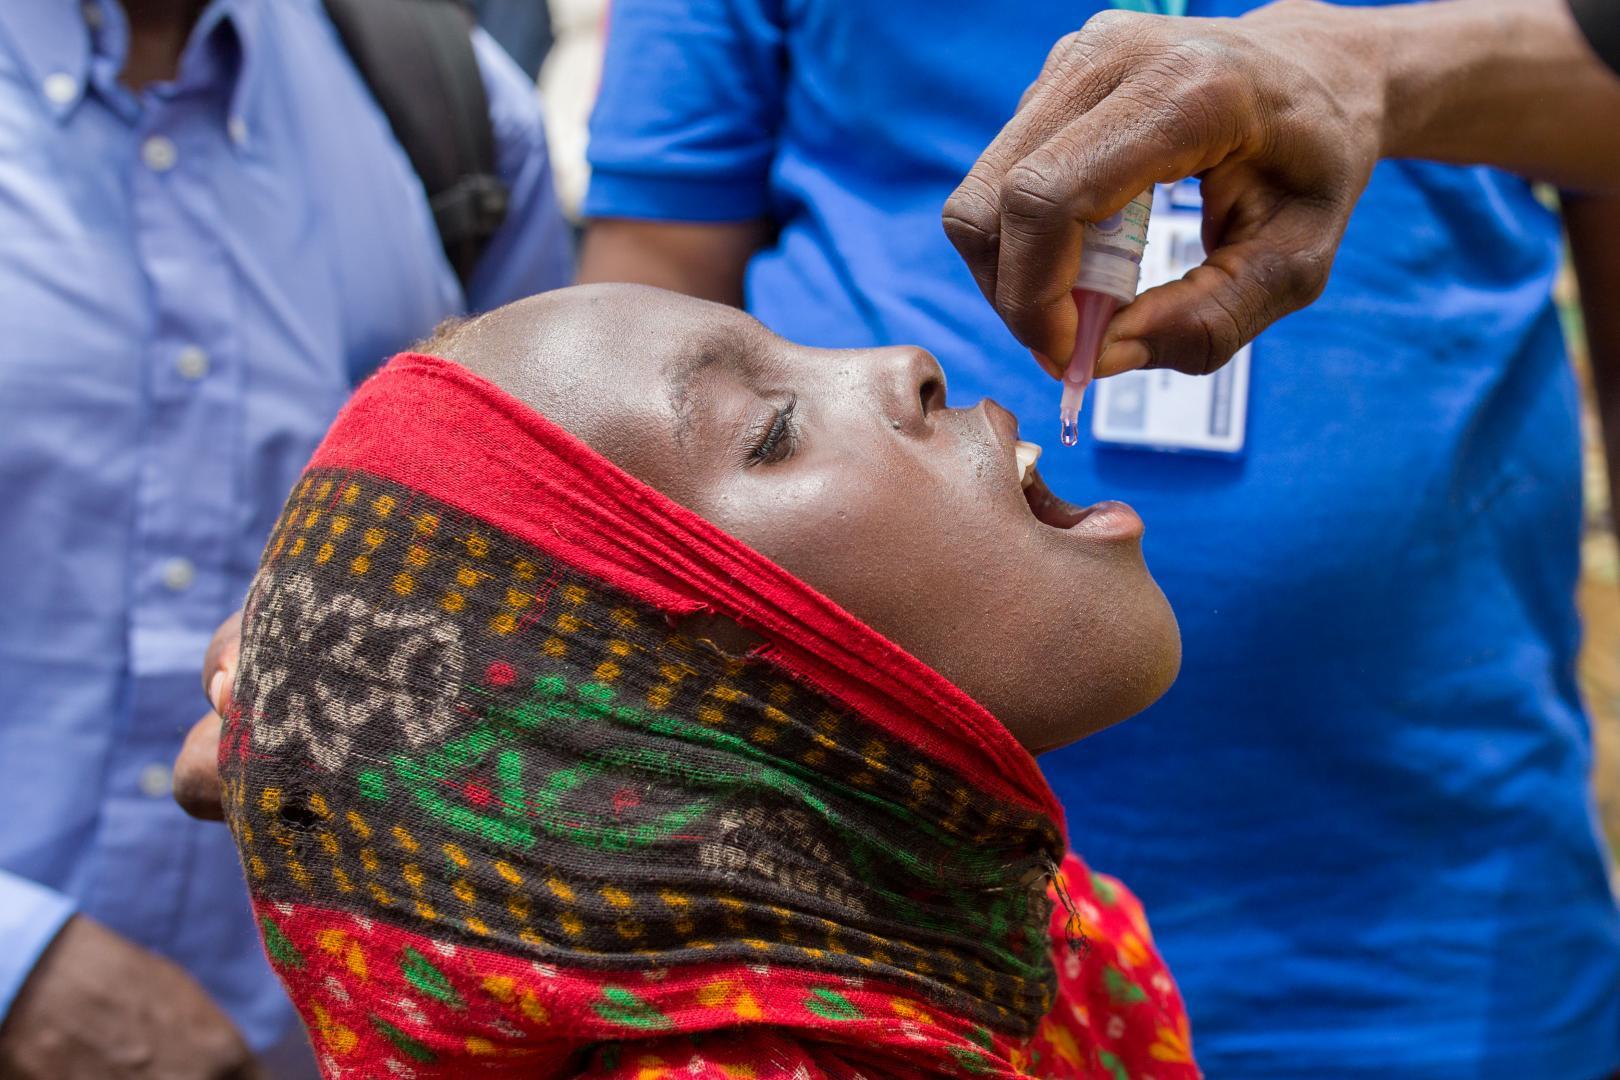 OMS, https://www.afro.who.int/news/africa-eradicates-wild-poliovirus